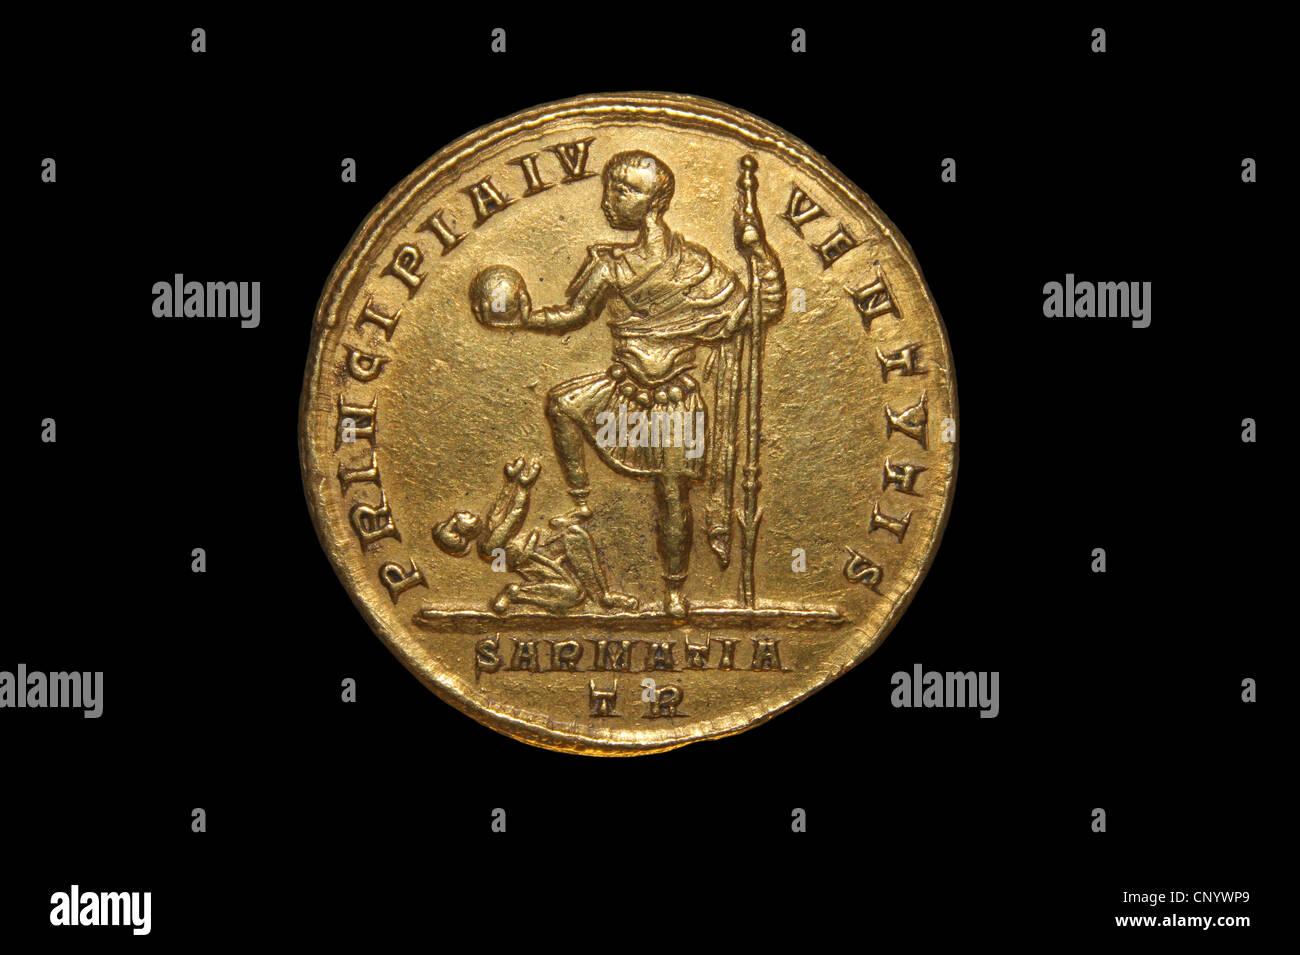 Gold Medallion Of Roman Emperor Constantine II - Stock Image